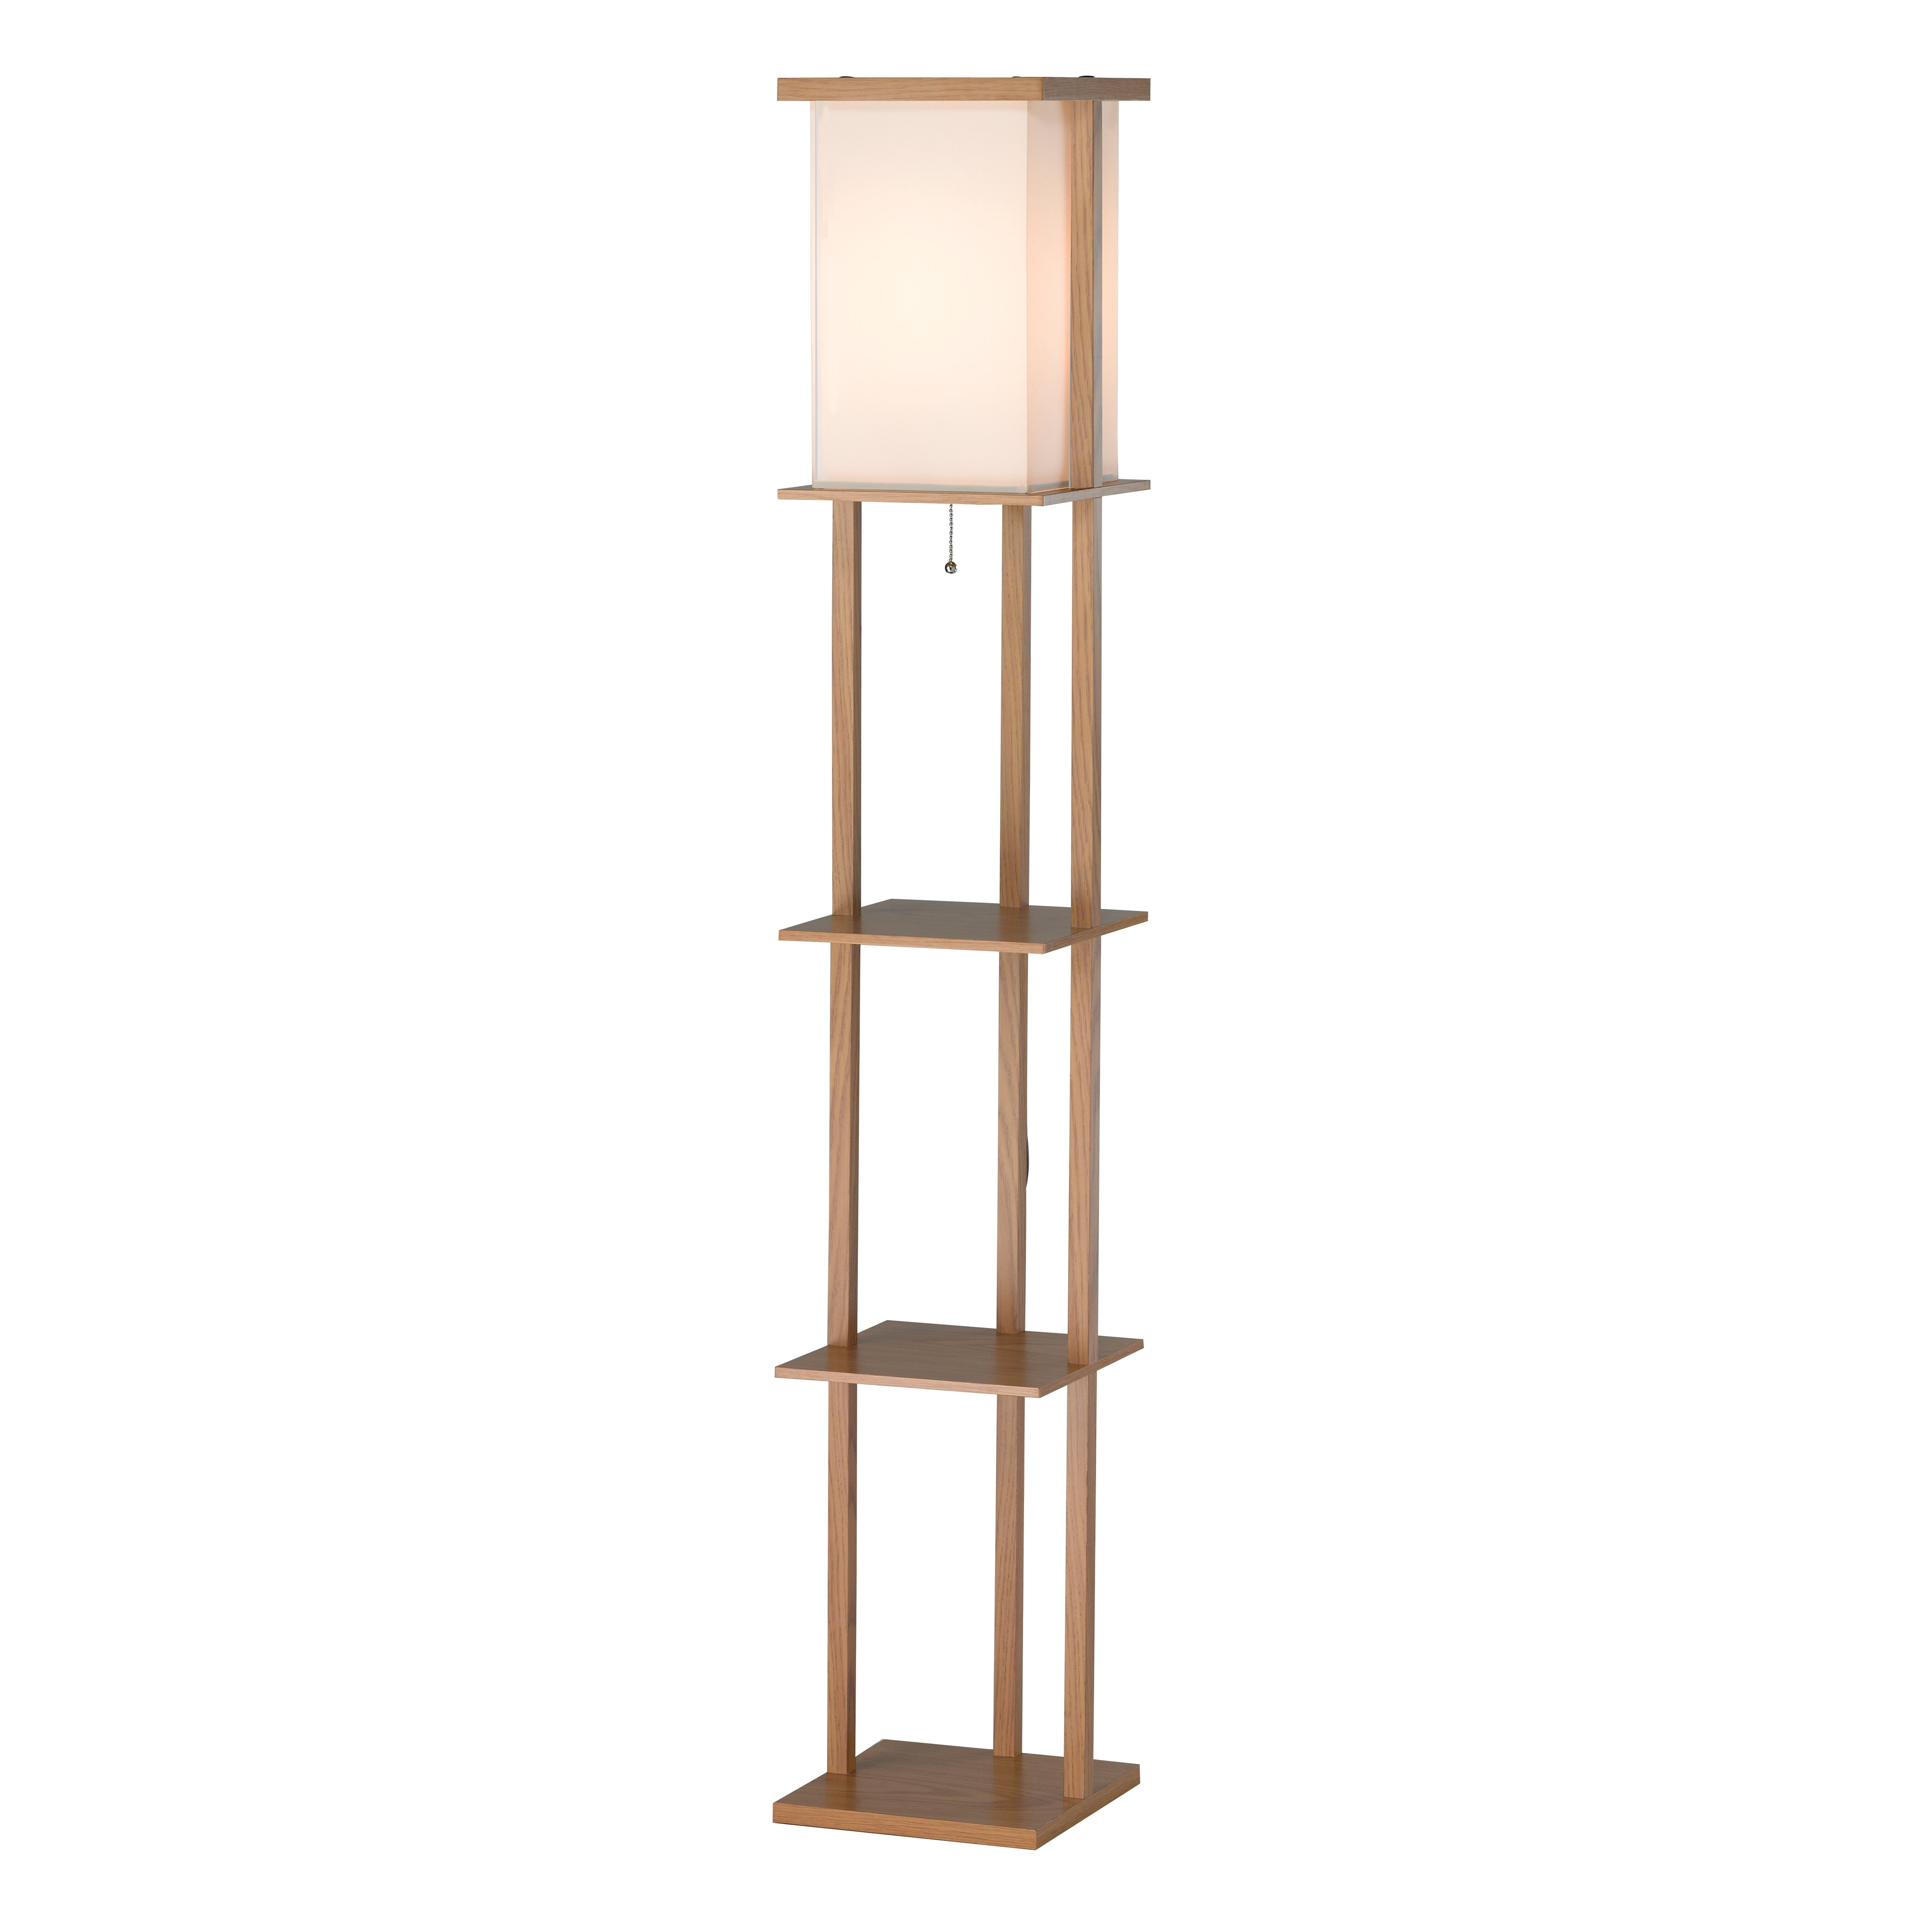 adesso barbery shelf 63 floor lamp reviews wayfair. Black Bedroom Furniture Sets. Home Design Ideas